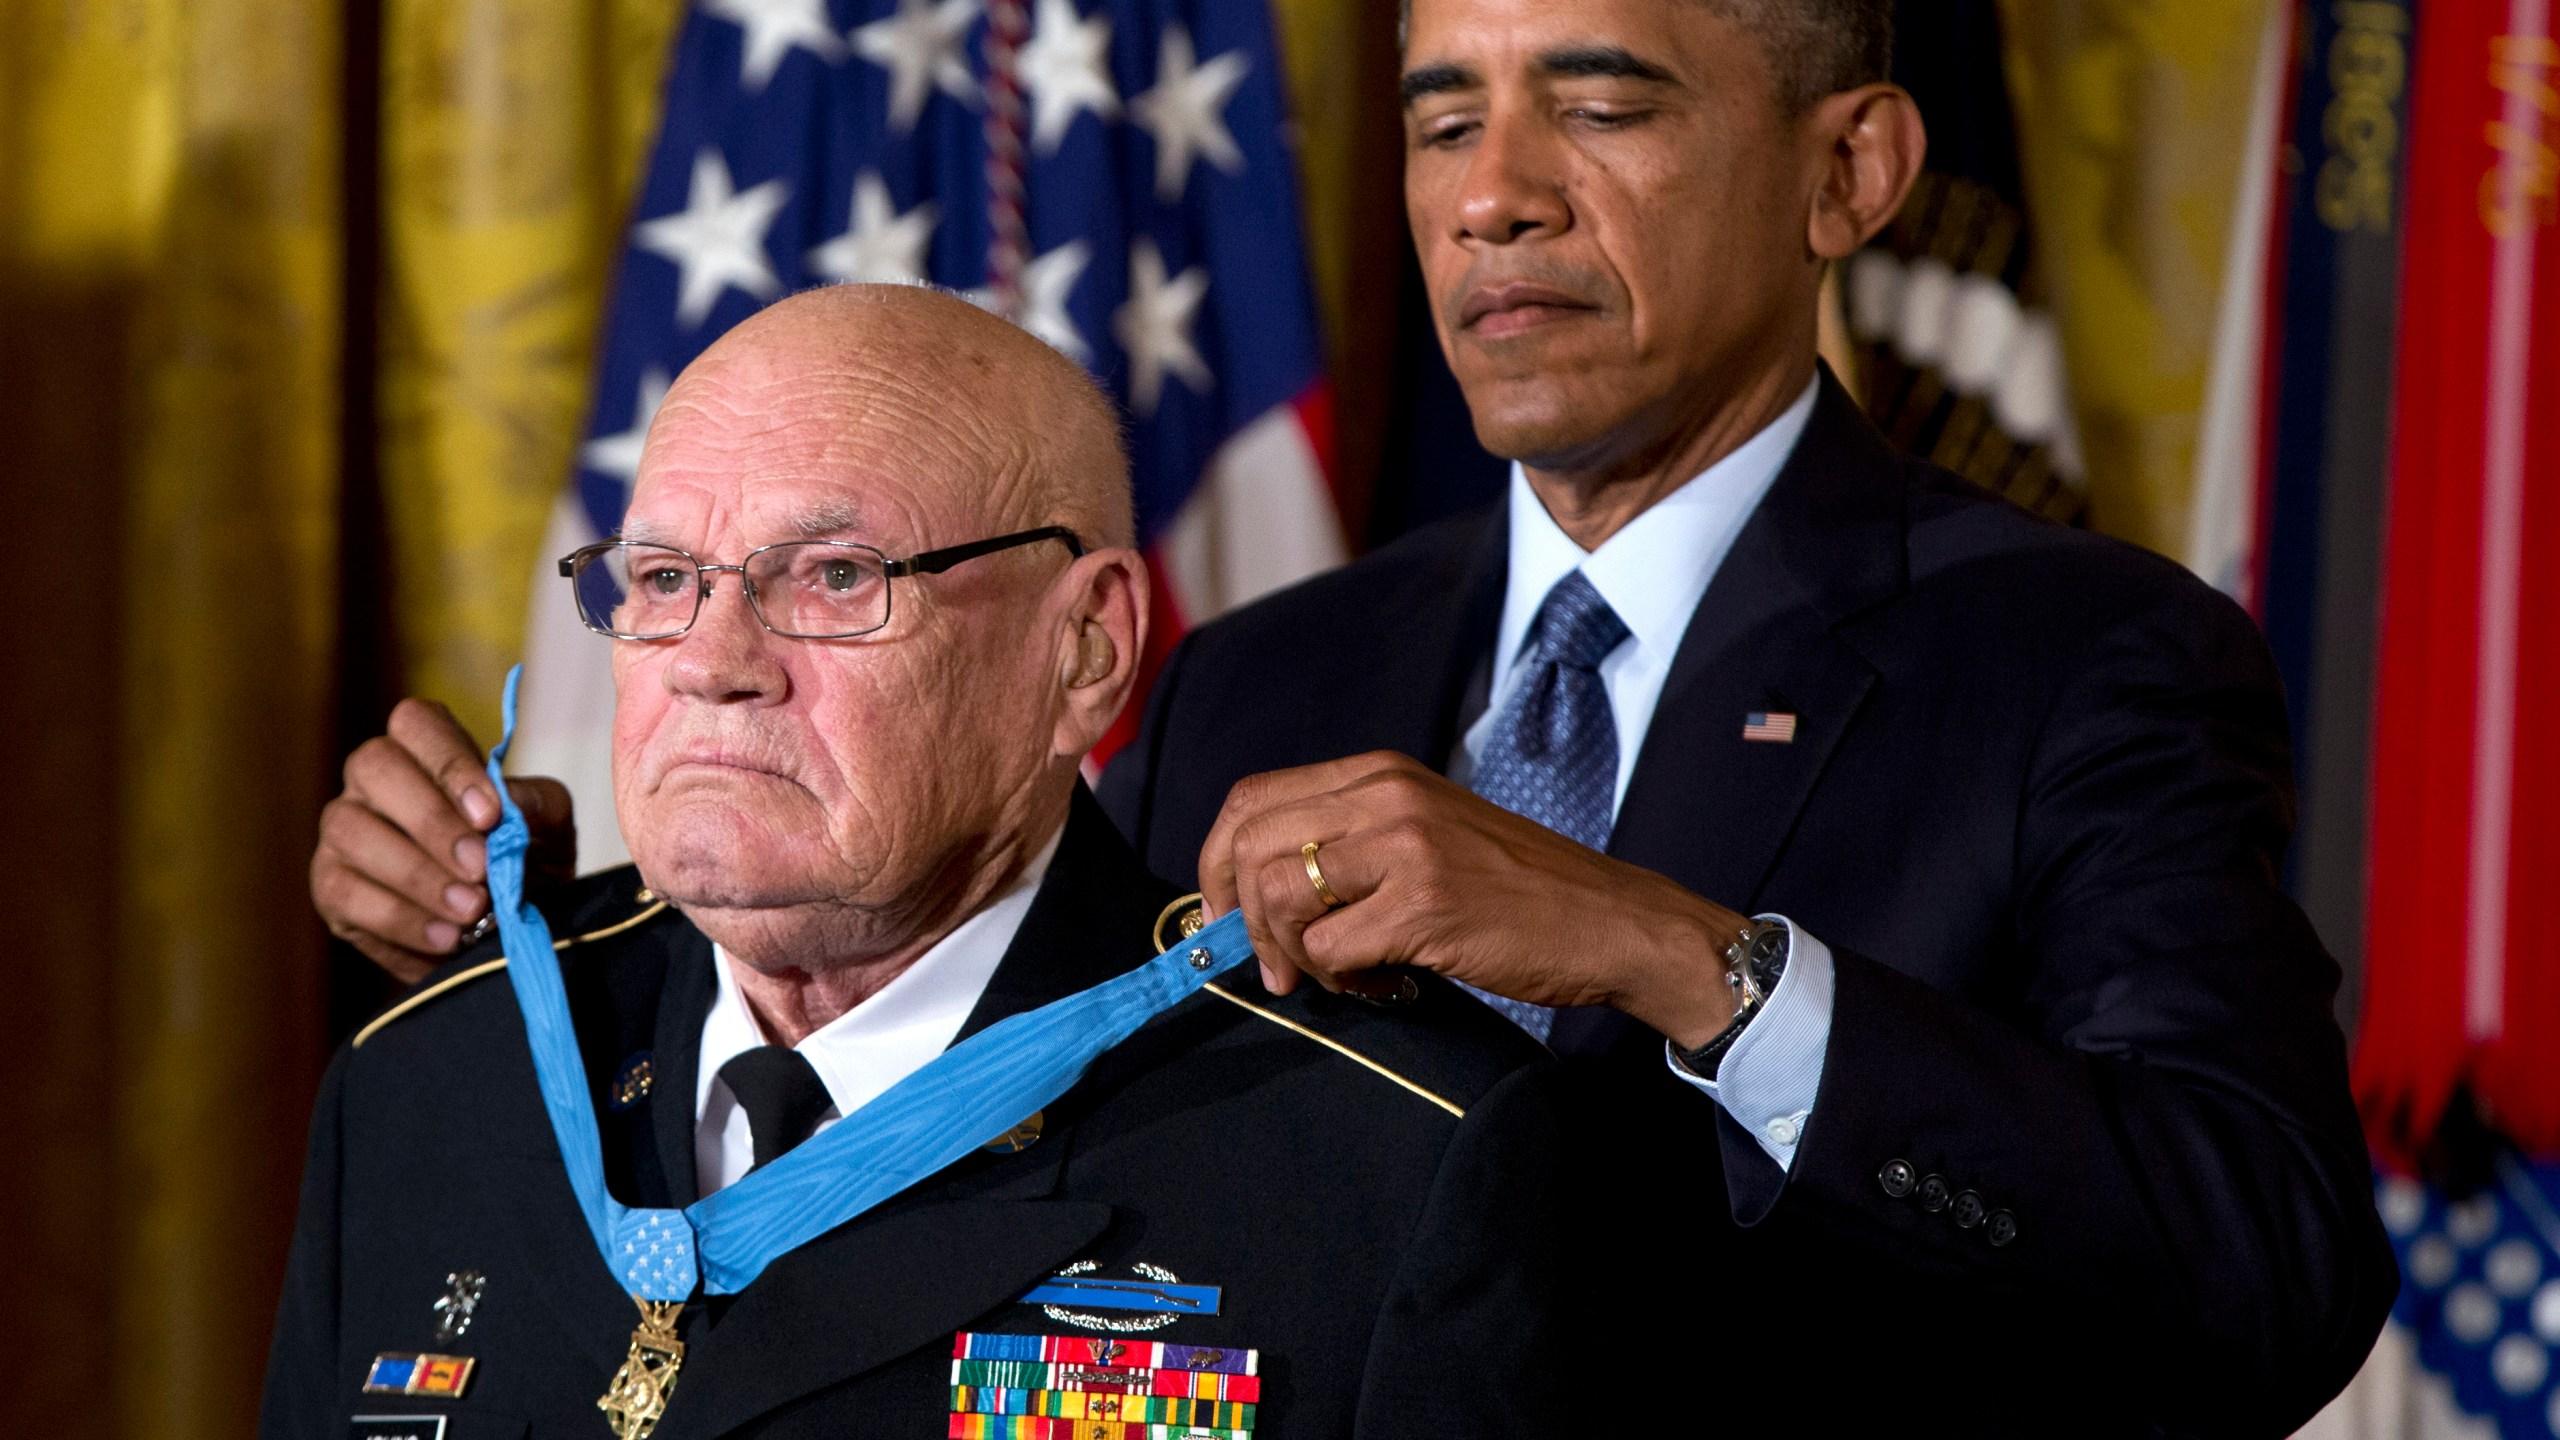 Barack Obama, Bennie G. Adkins